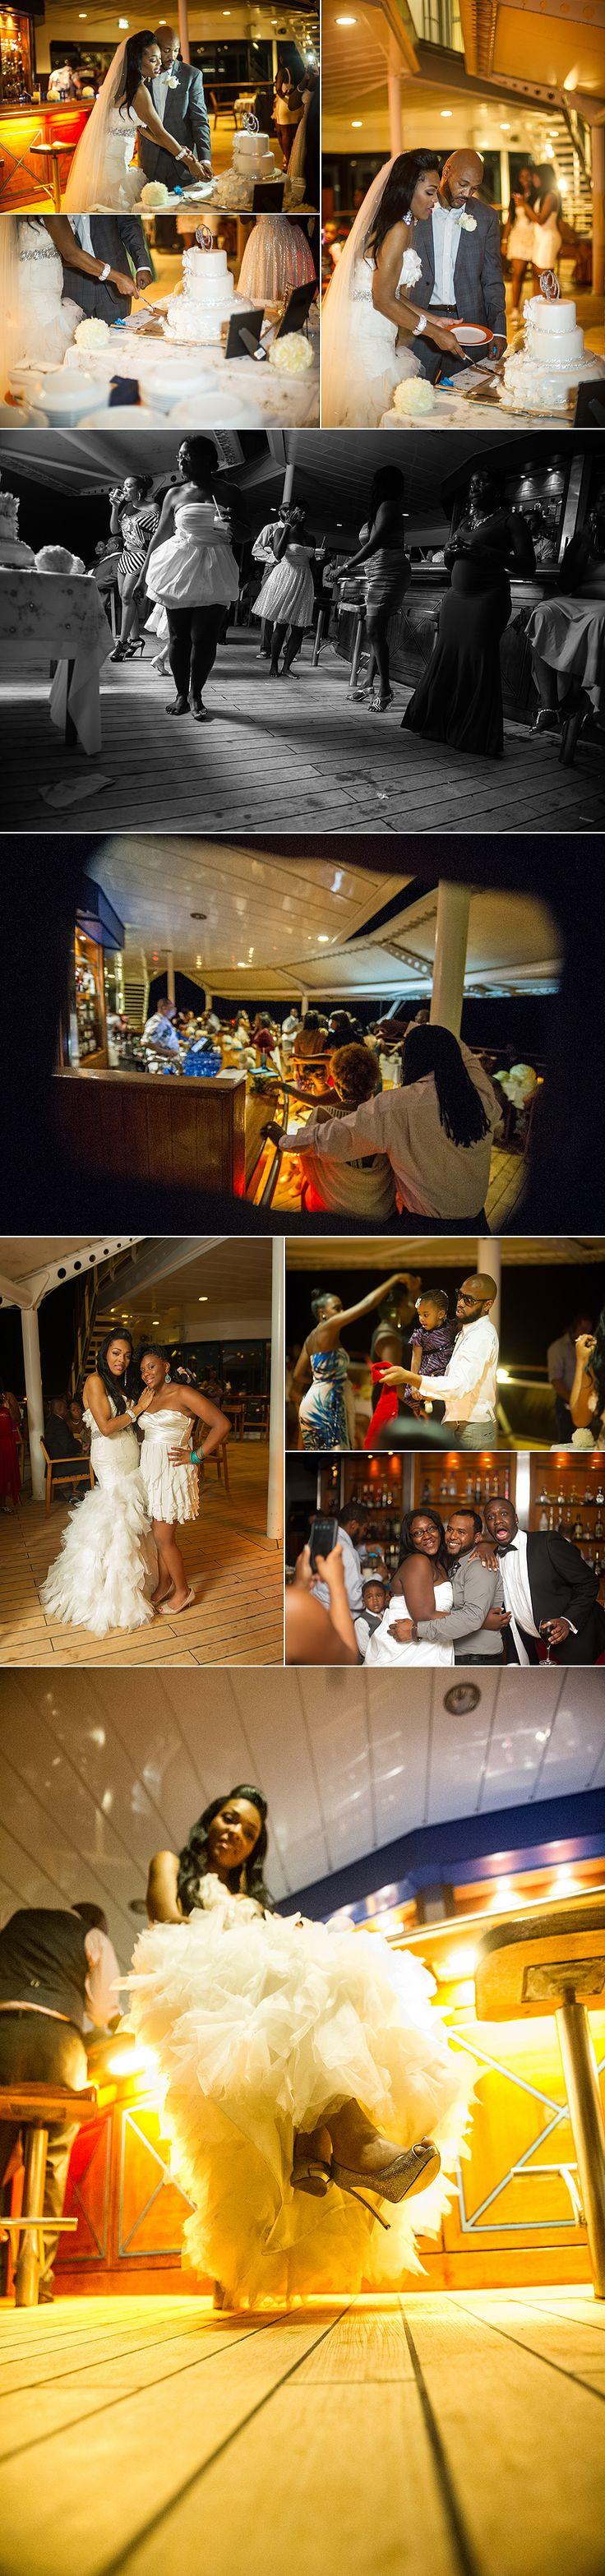 Cruise Weddings & Destination Wedding Packages | Royal ...